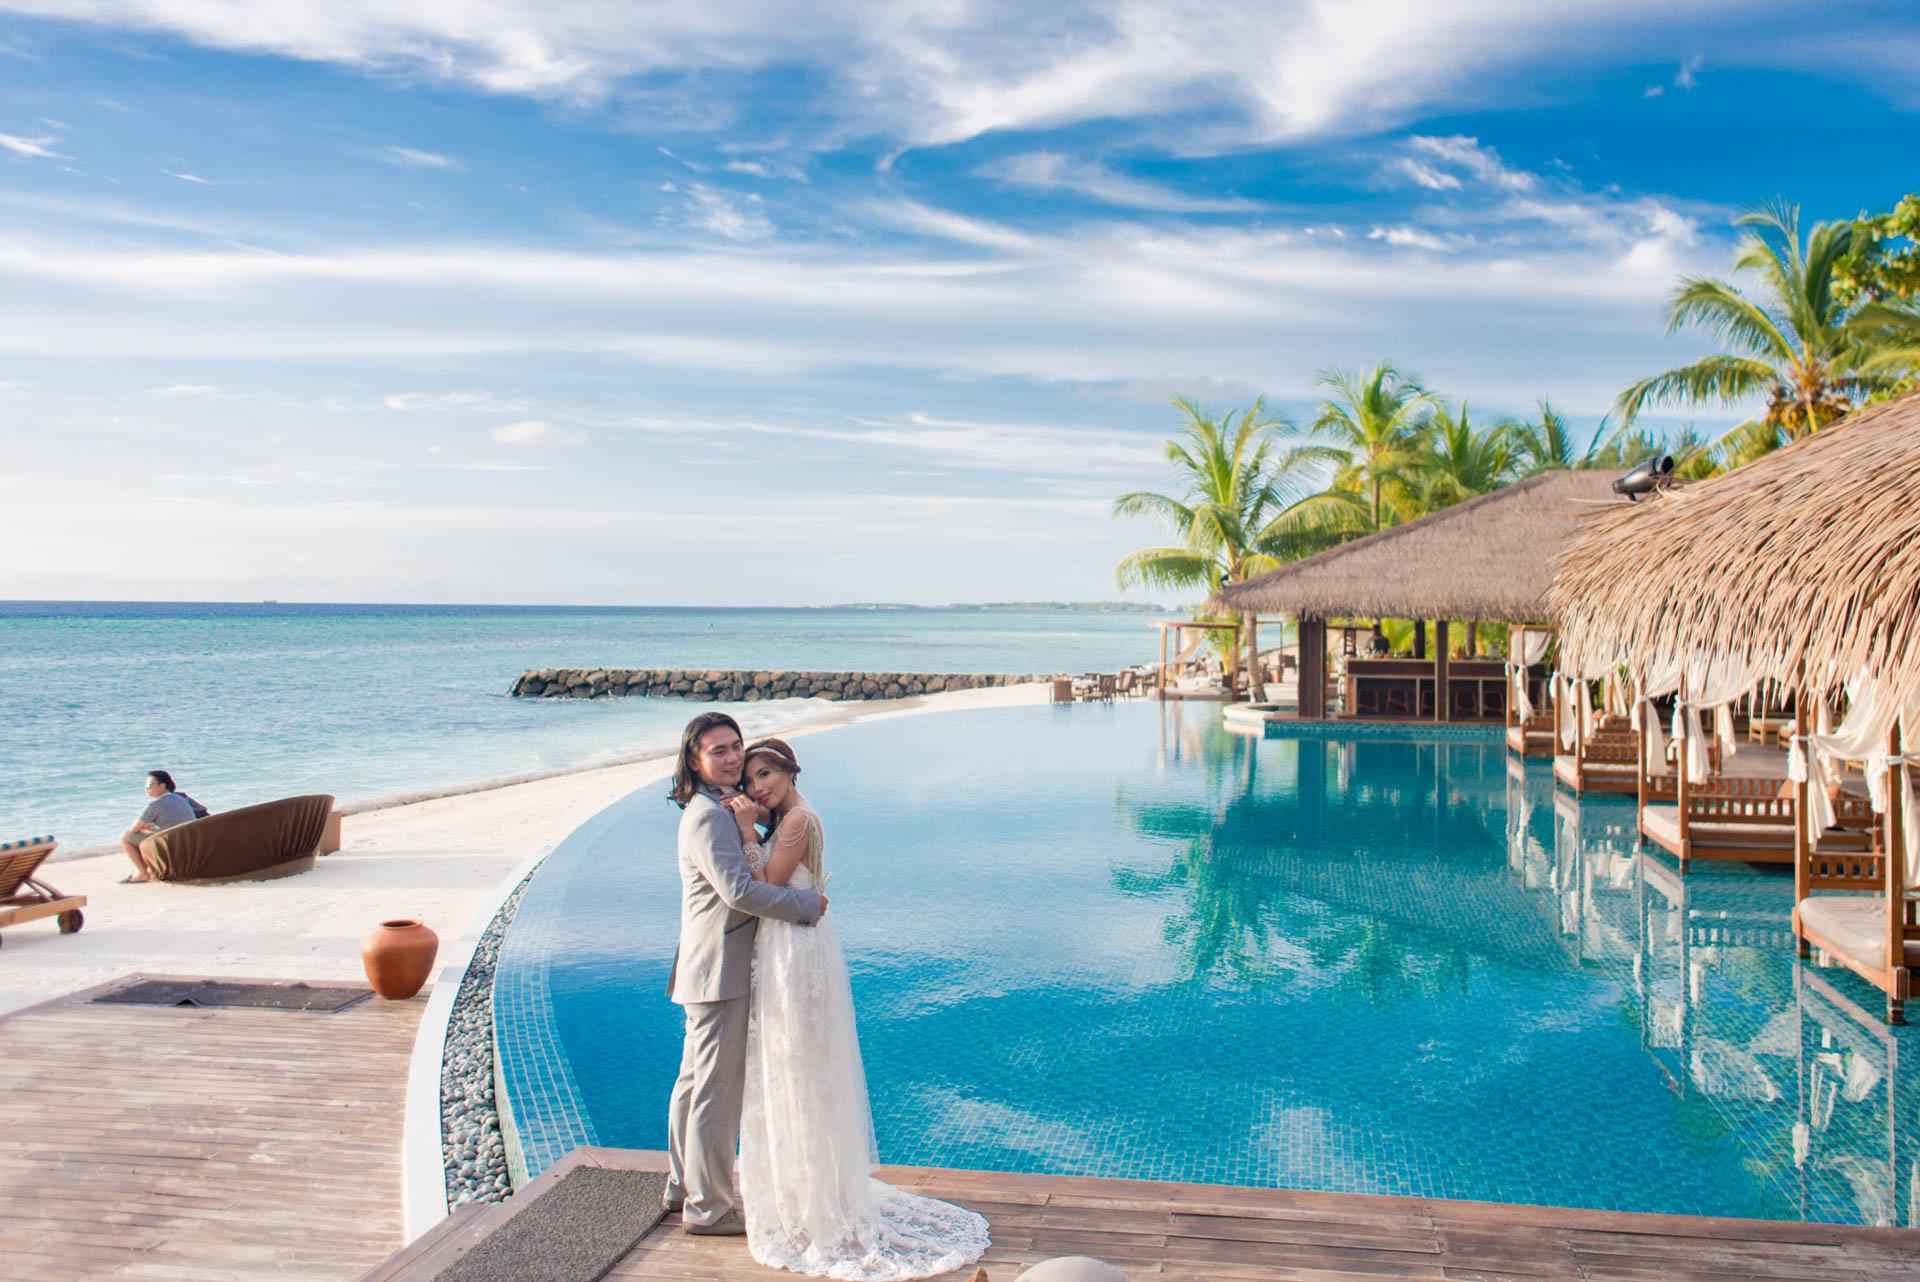 Chih Chao Yu Shan Destination Wedding at Residence Maldives 9